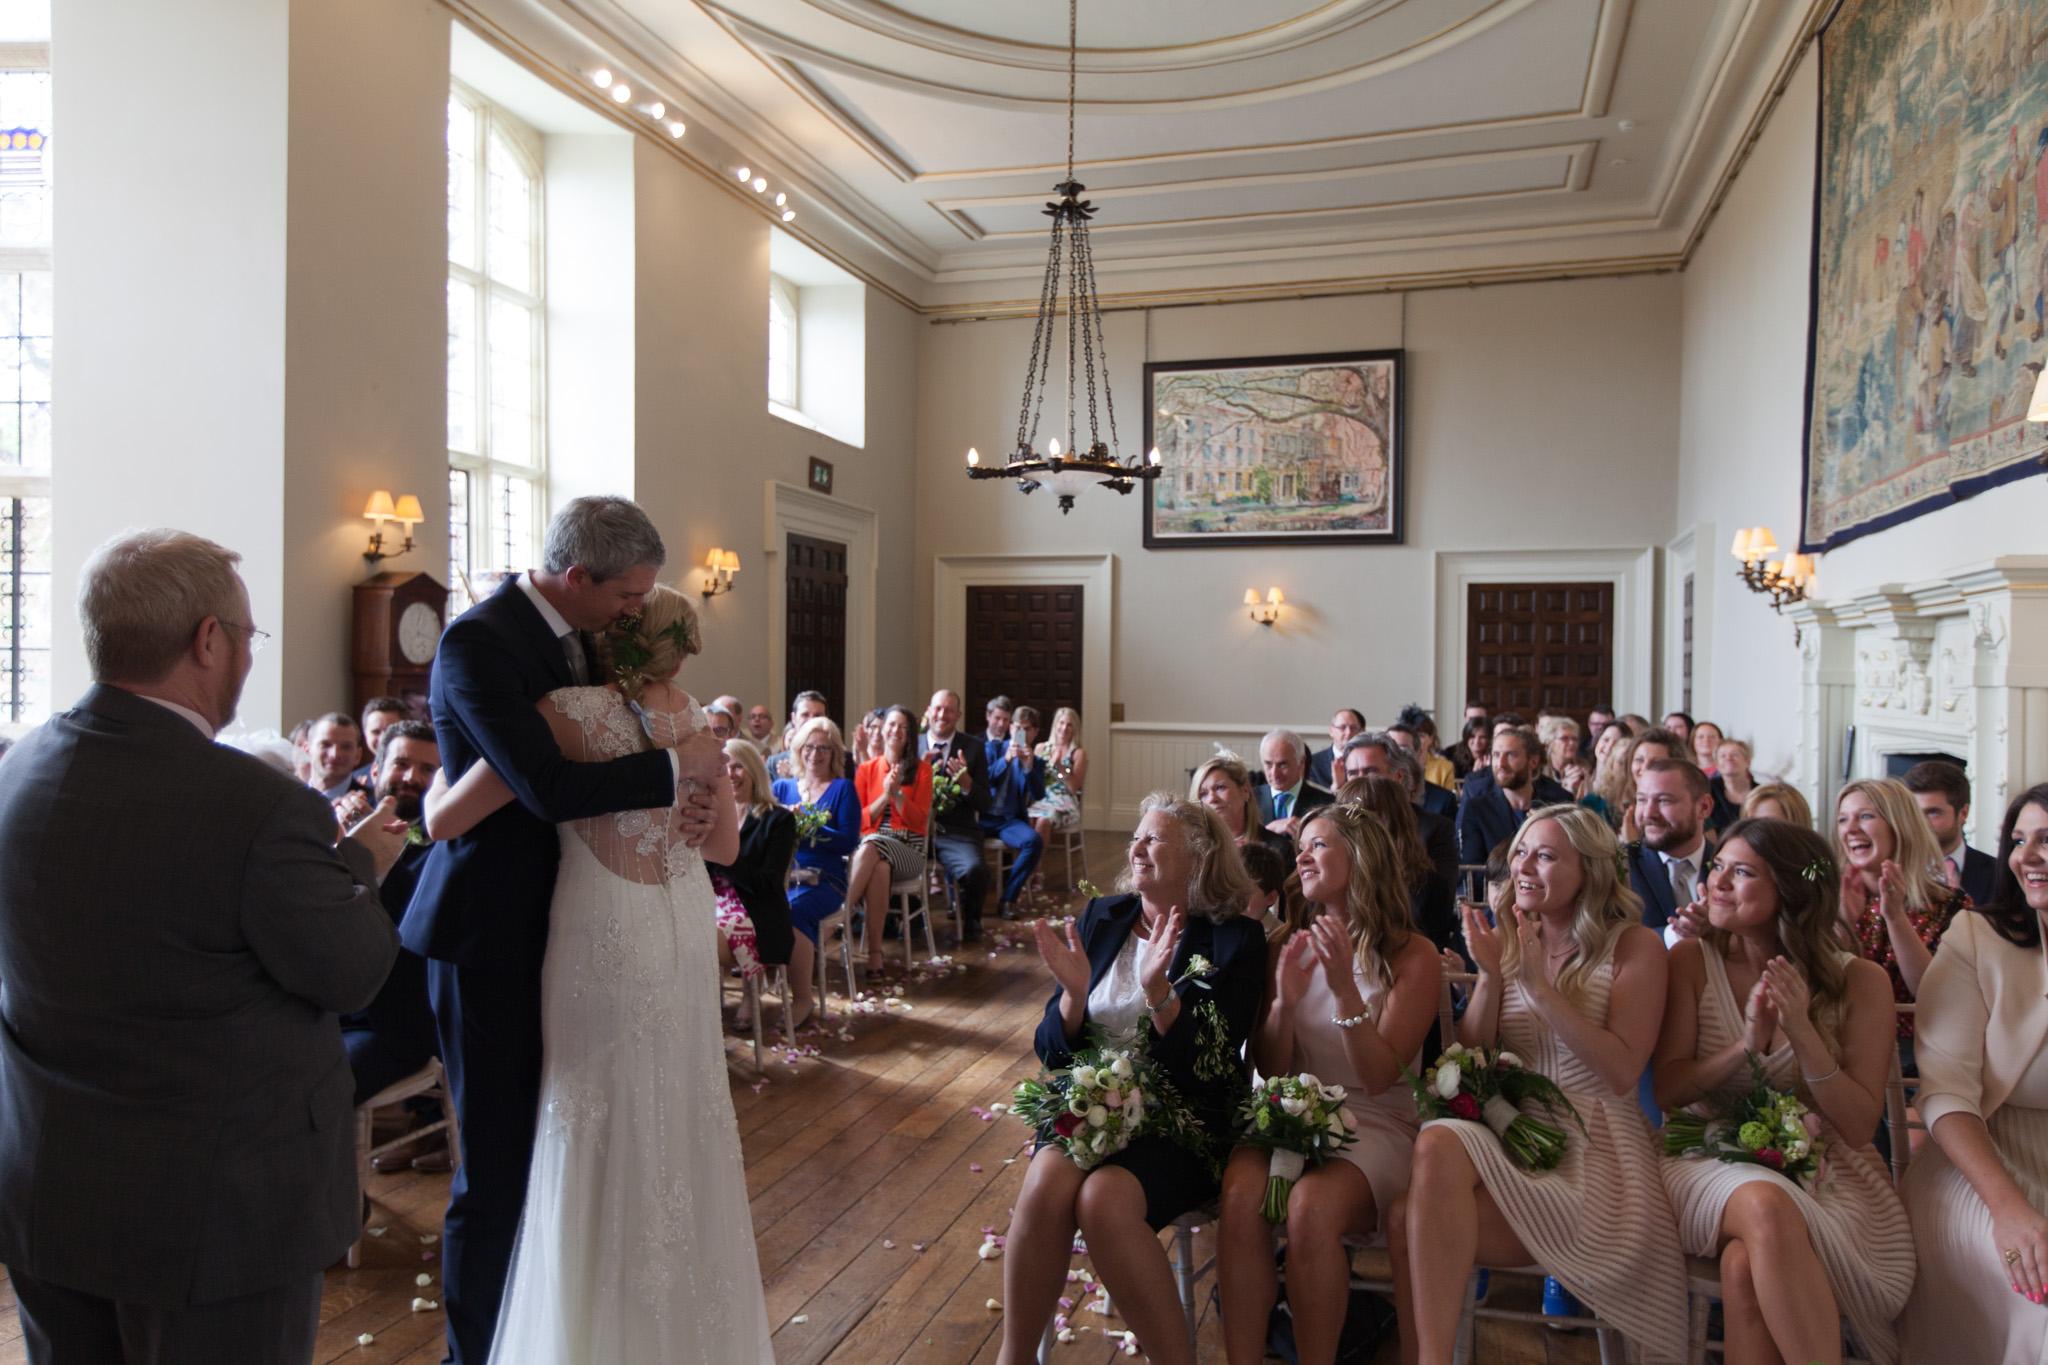 Mark_Barnes_Gloucester_Wedding_Photographer_Elmore_Court_Wedding_Photography_Mike+Kelly-50.jpg